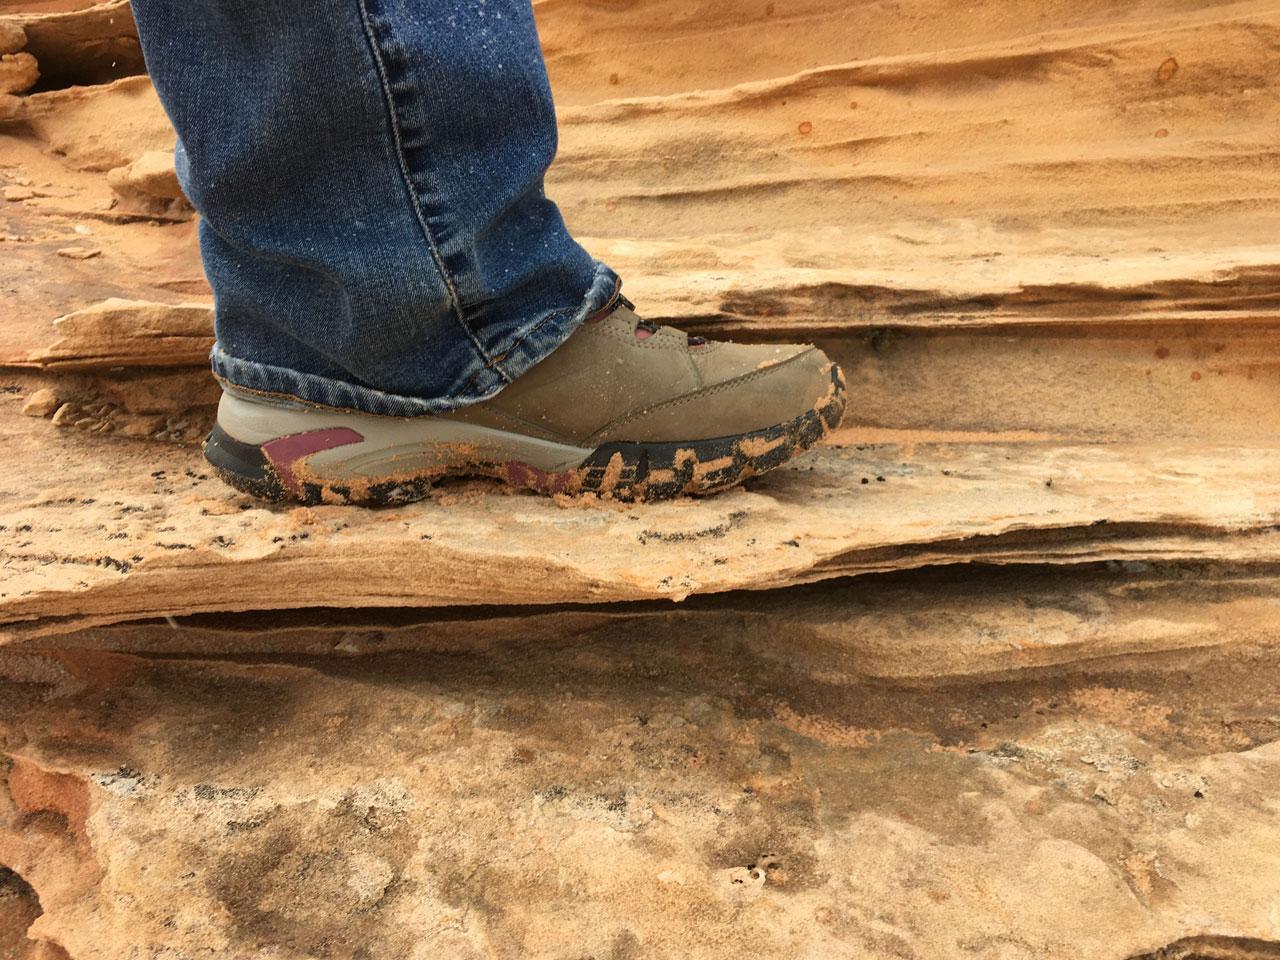 Appreciating the delicate sandstone fins of Vermilion Cliffs National Monument